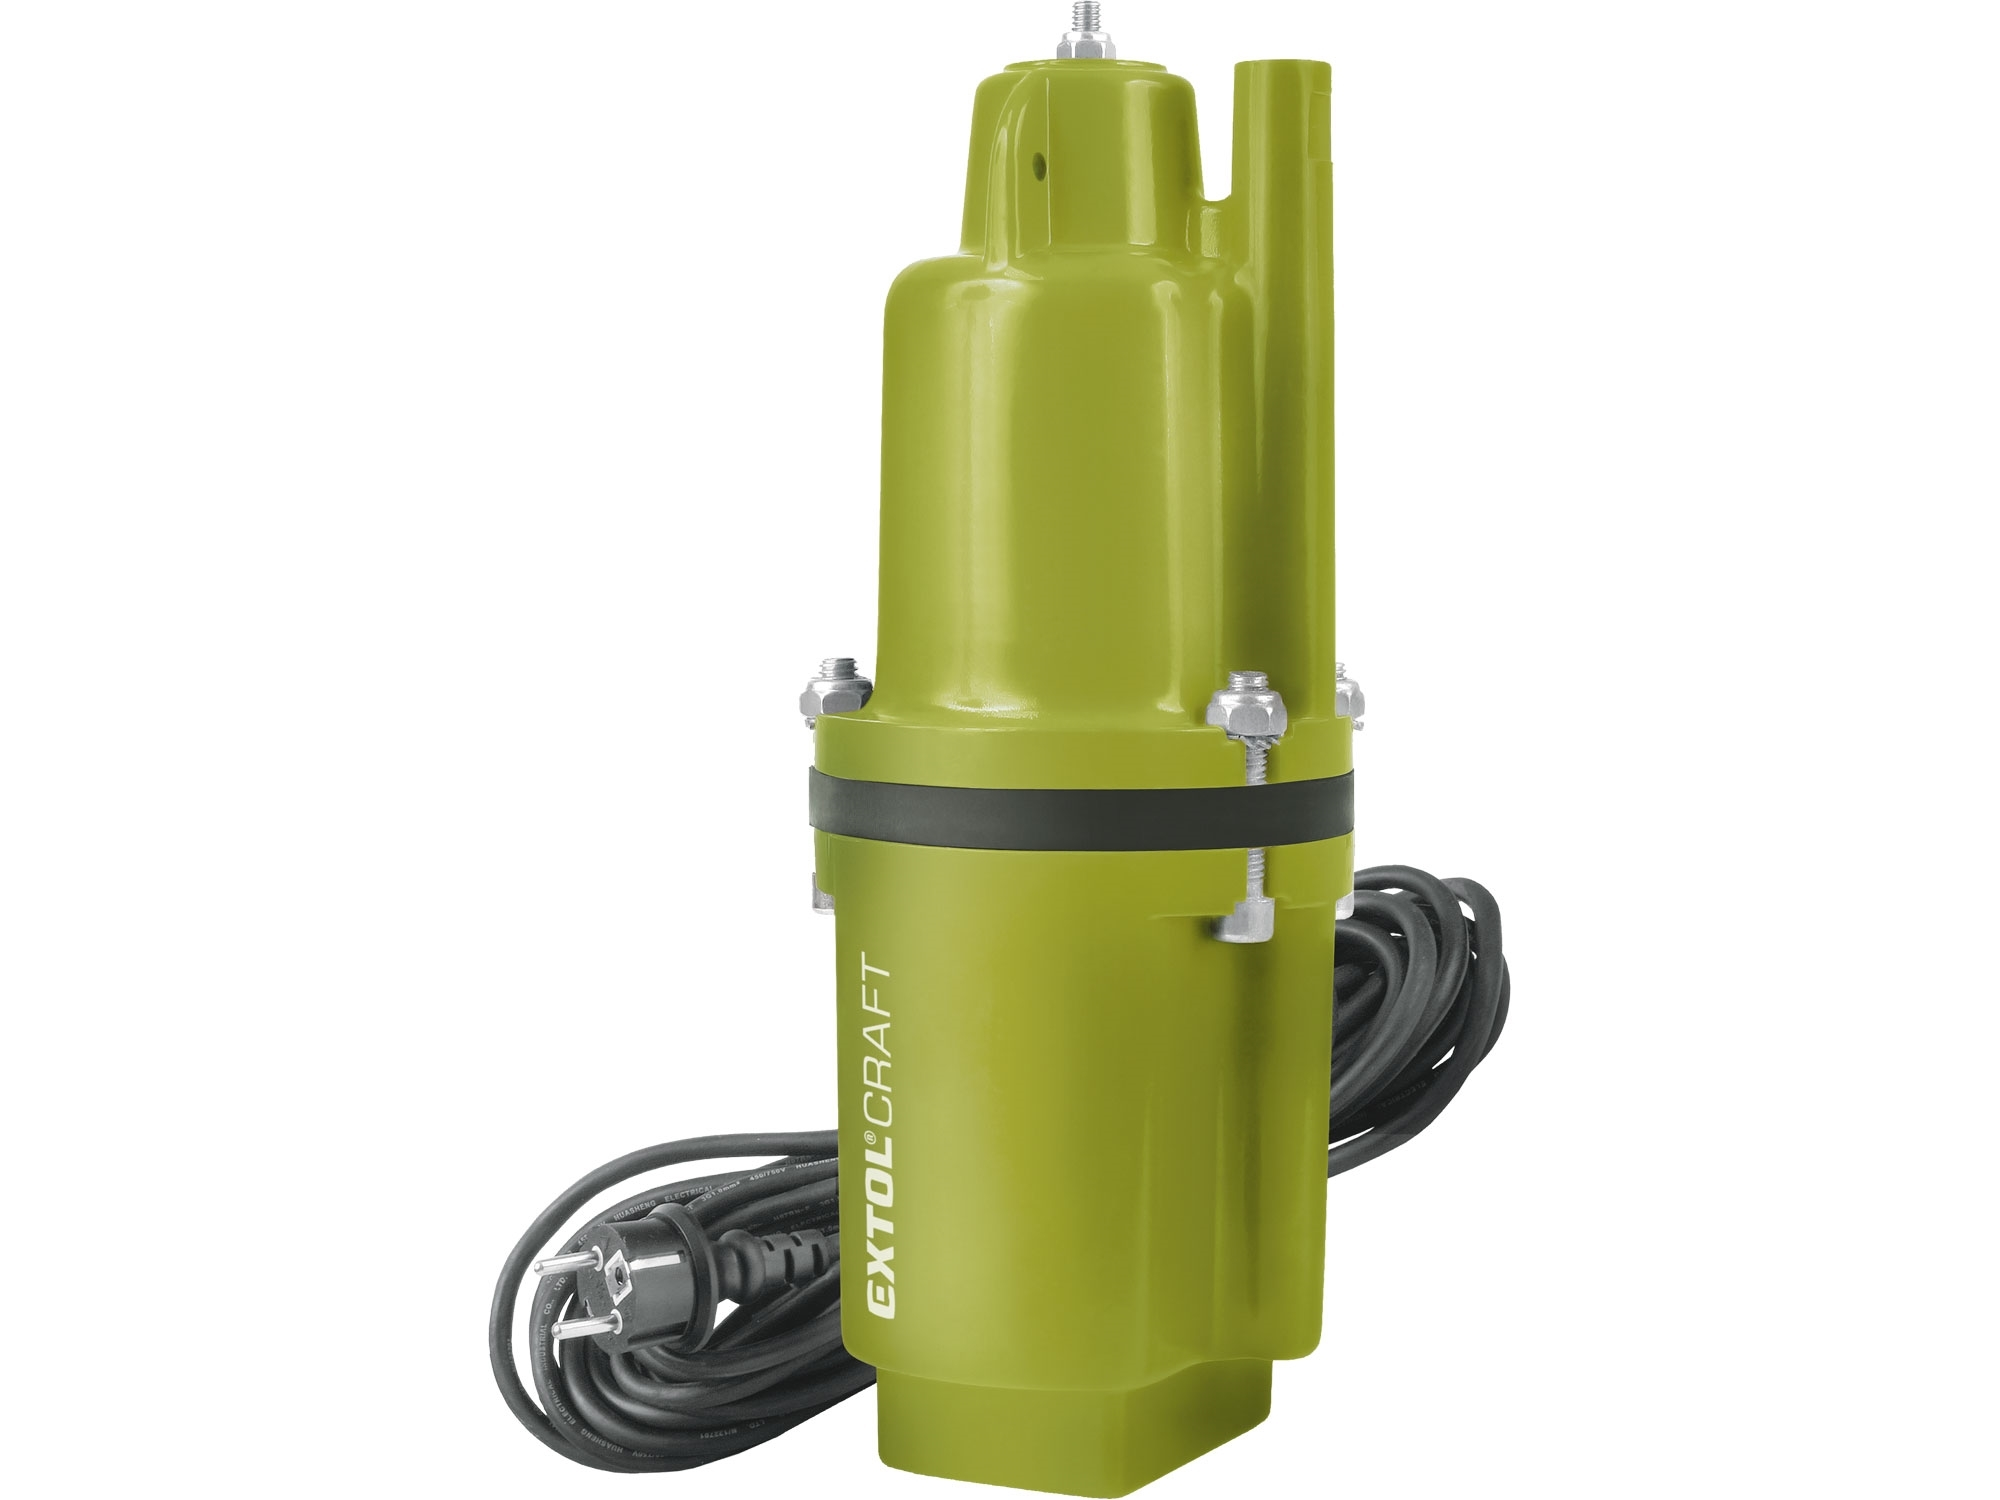 čerpadlo membránové hlubinné ponorné, 300W, 1400l/hod, 20m, EXTOL CRAFT 414171